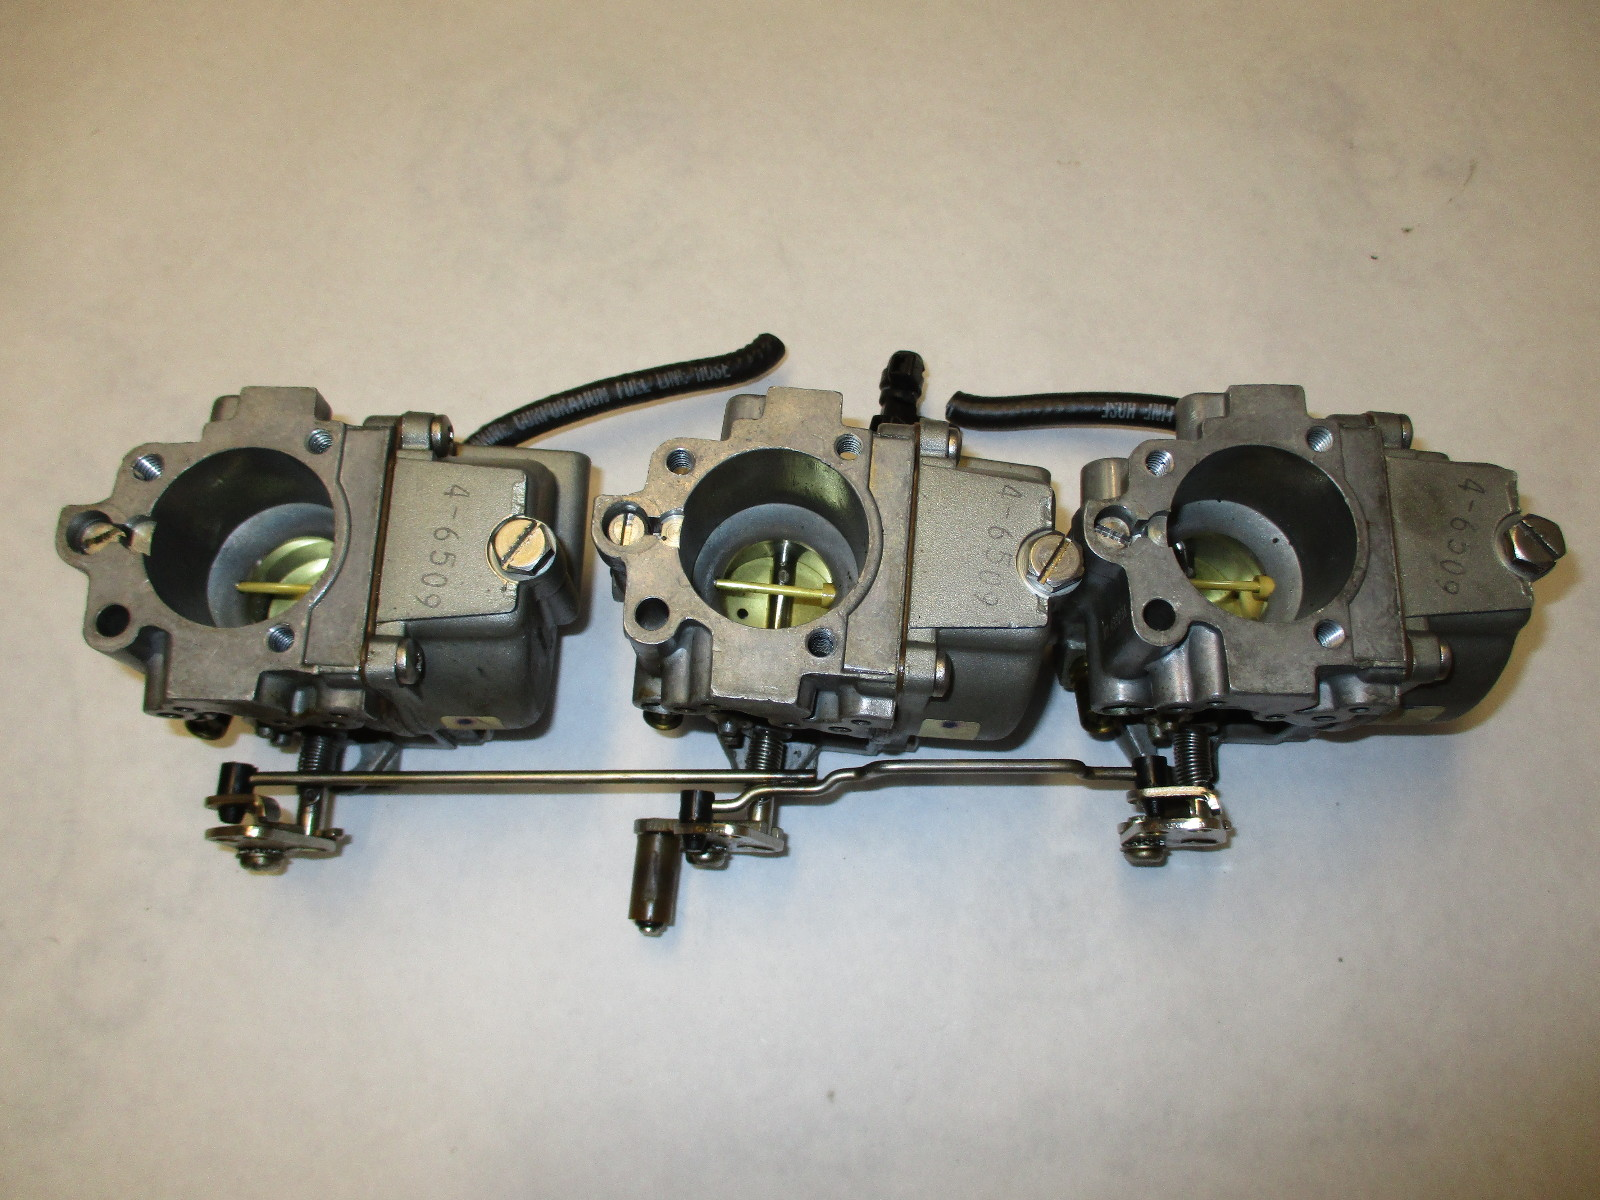 Details about 0433237 0436664 Evinrude Johnson 60 Hp Outboard Carburetor  Assembly